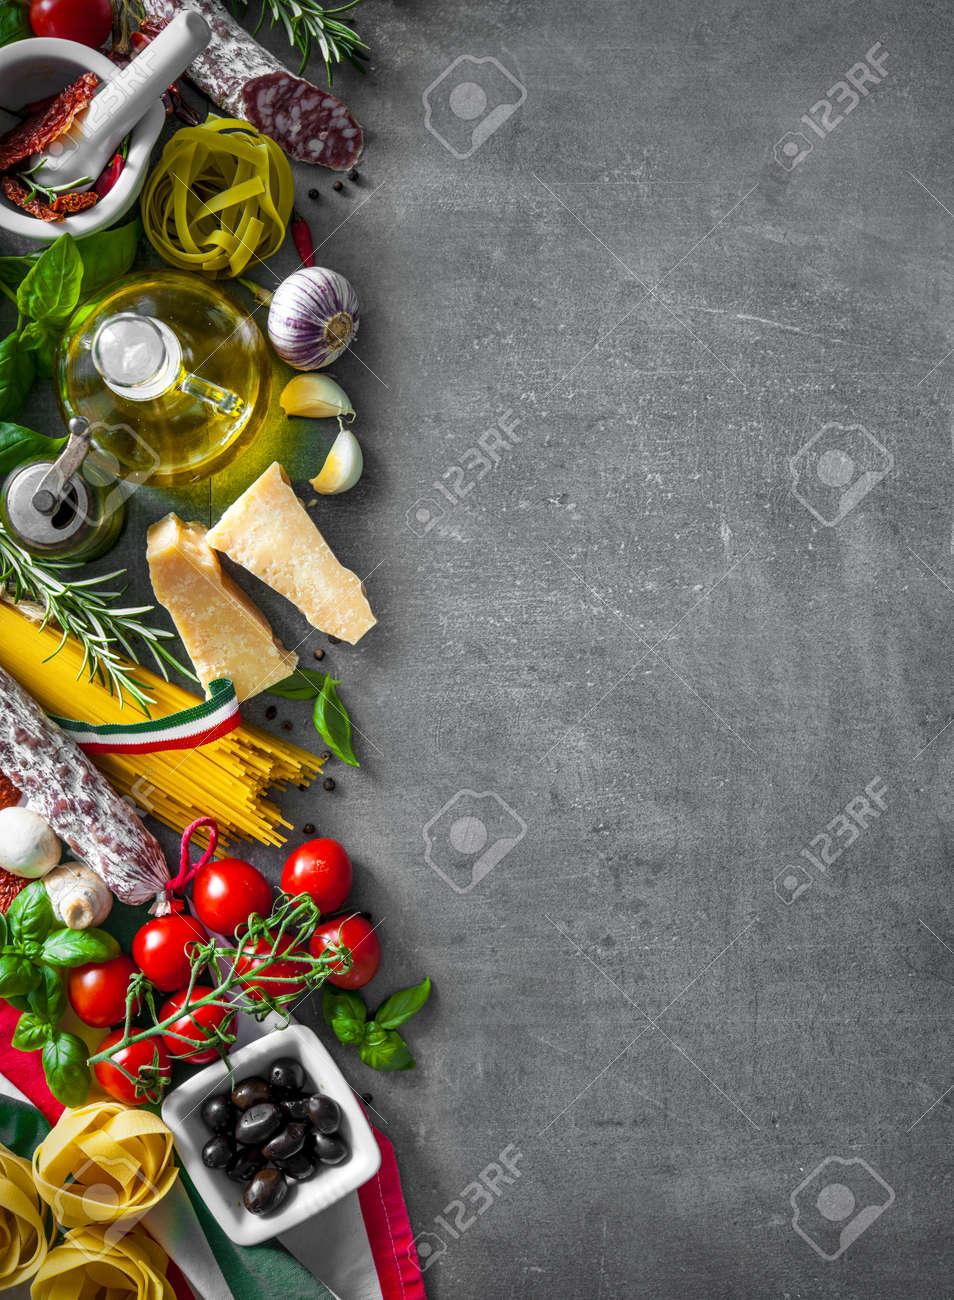 Italian food ingredients on slate background - 56306720